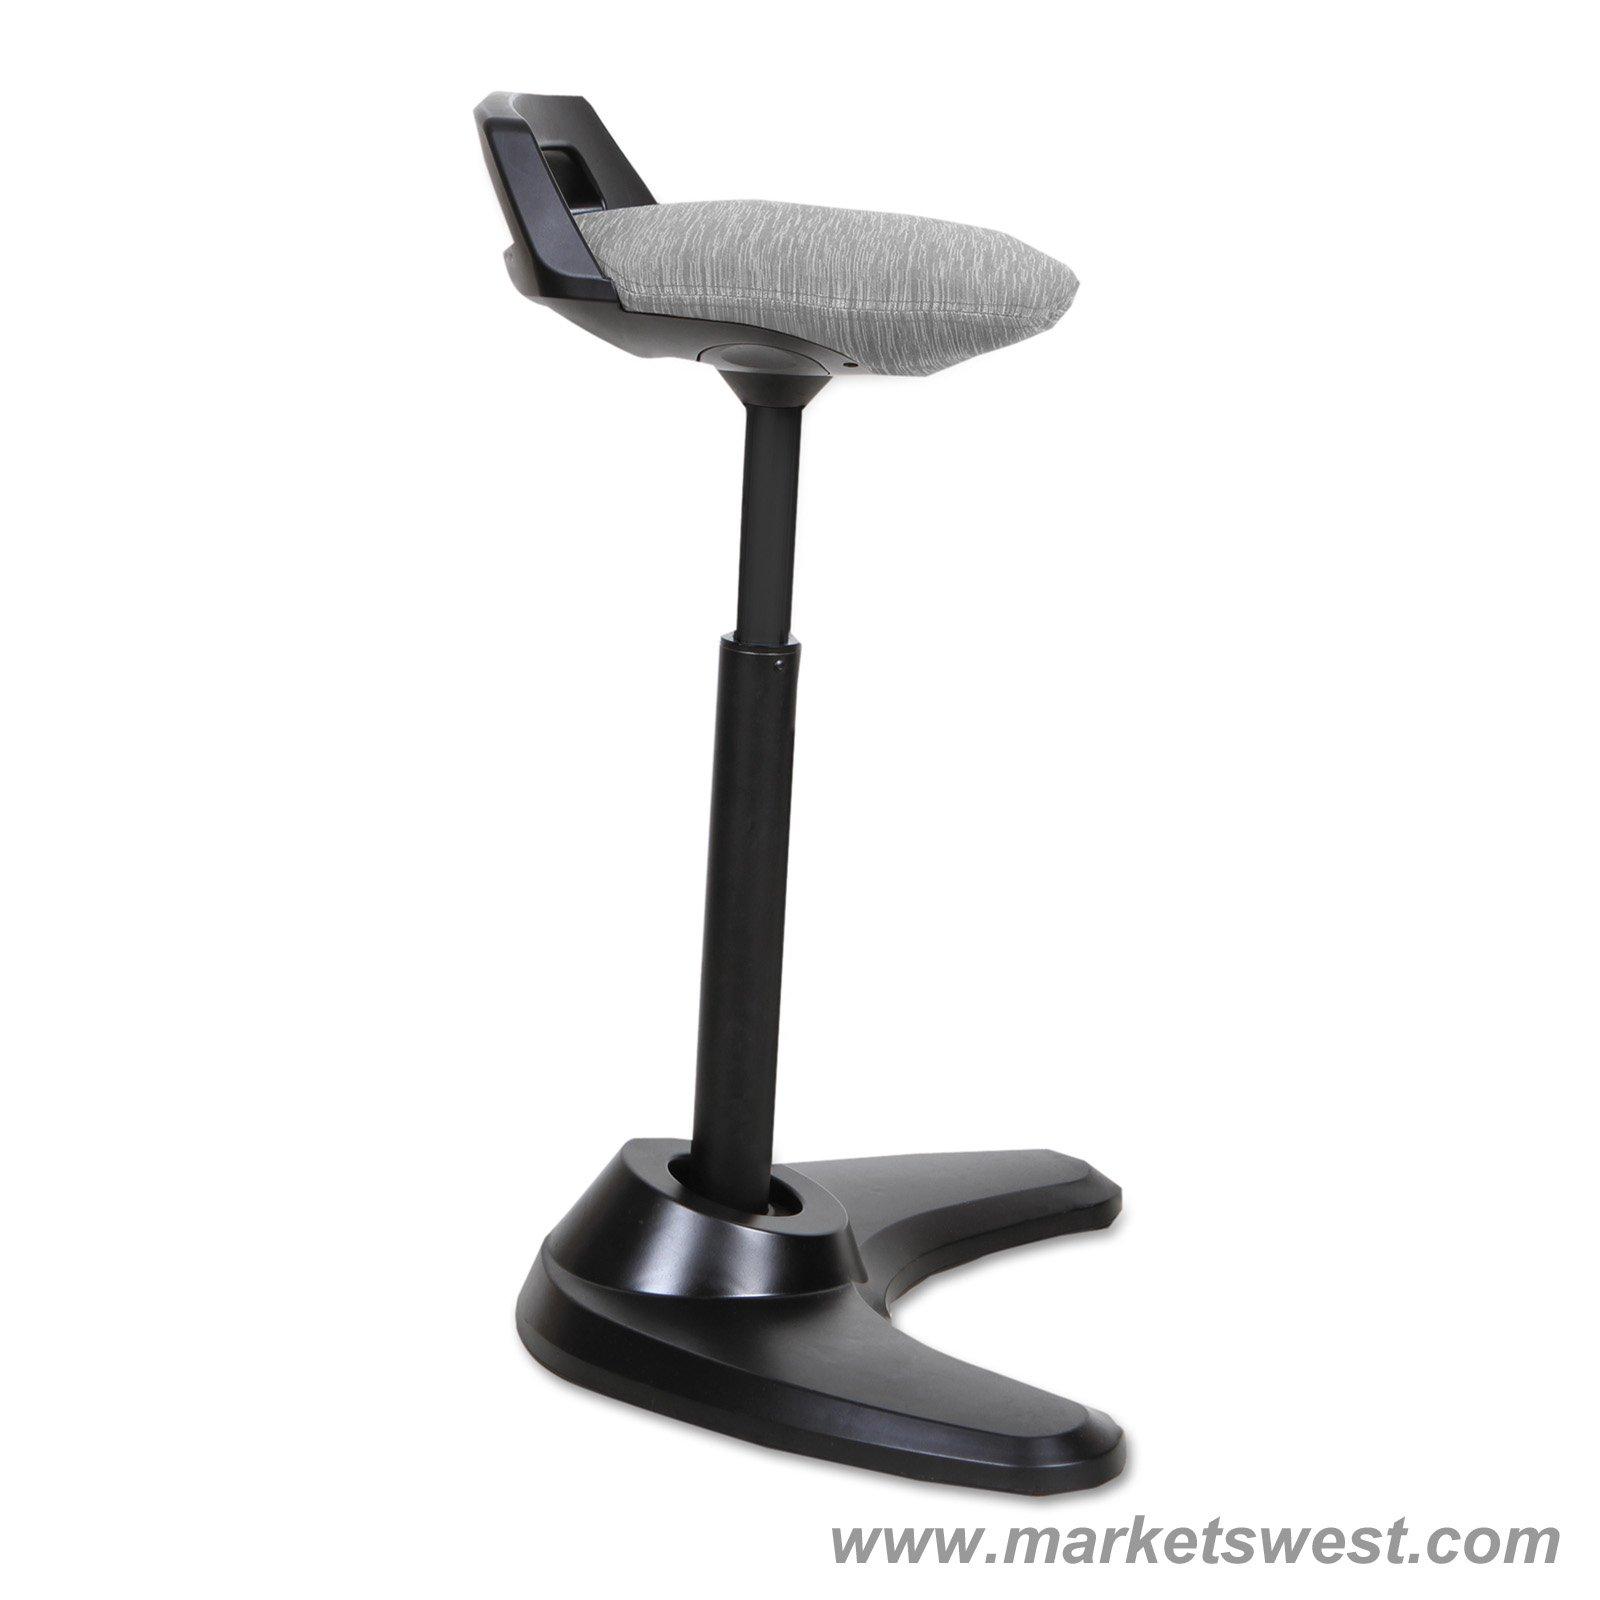 Alera Sit To Stand Perch Stool Alera Activergo Series Sit